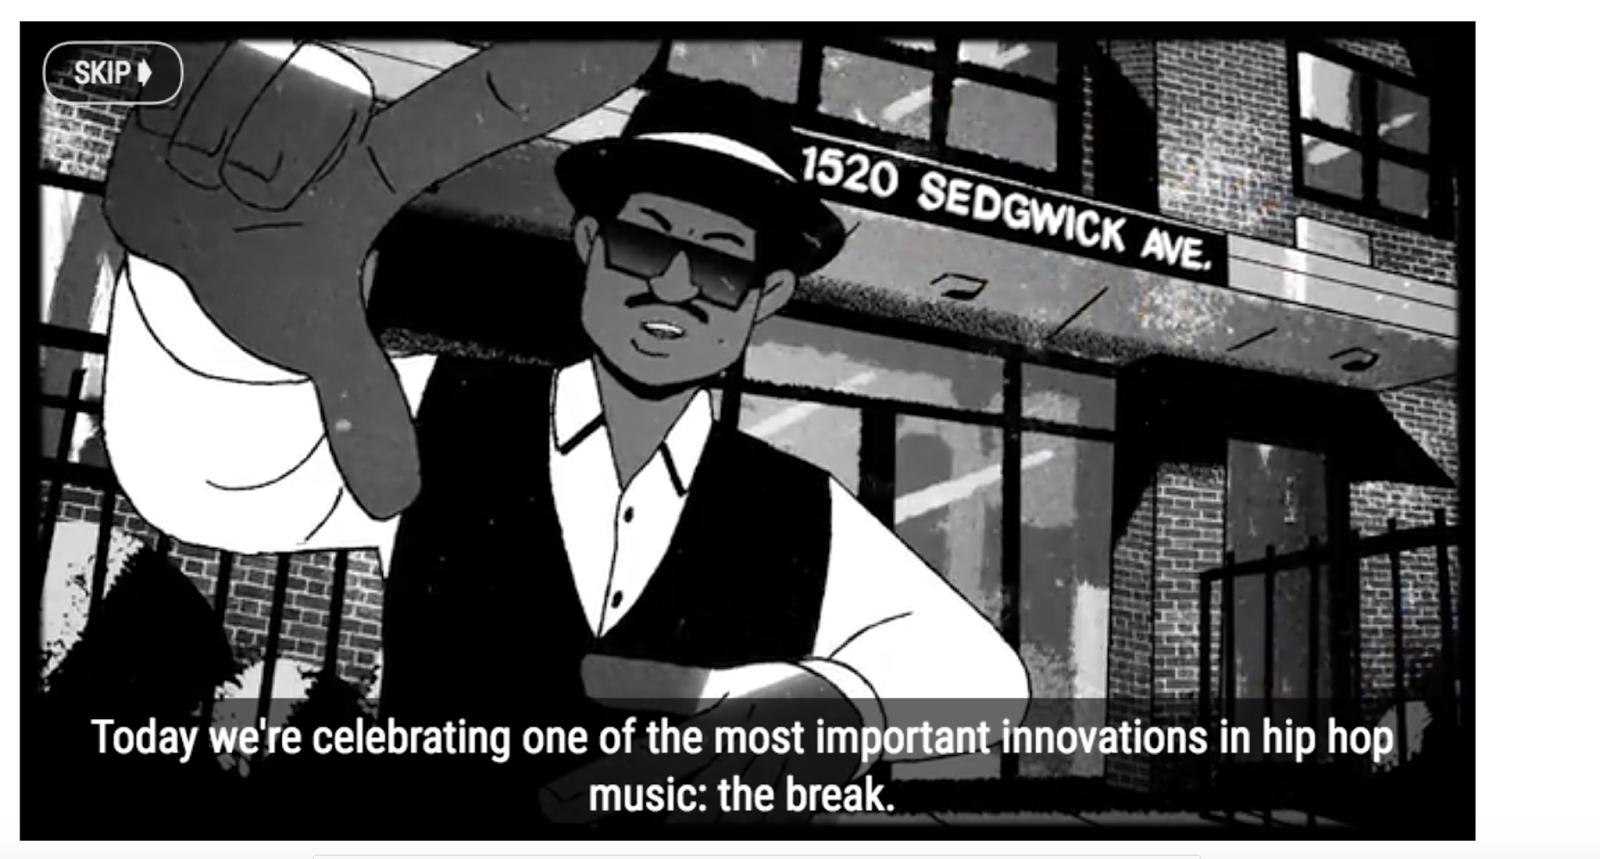 Google Homepage Celebrates 44th Anniversary of Hip Hop